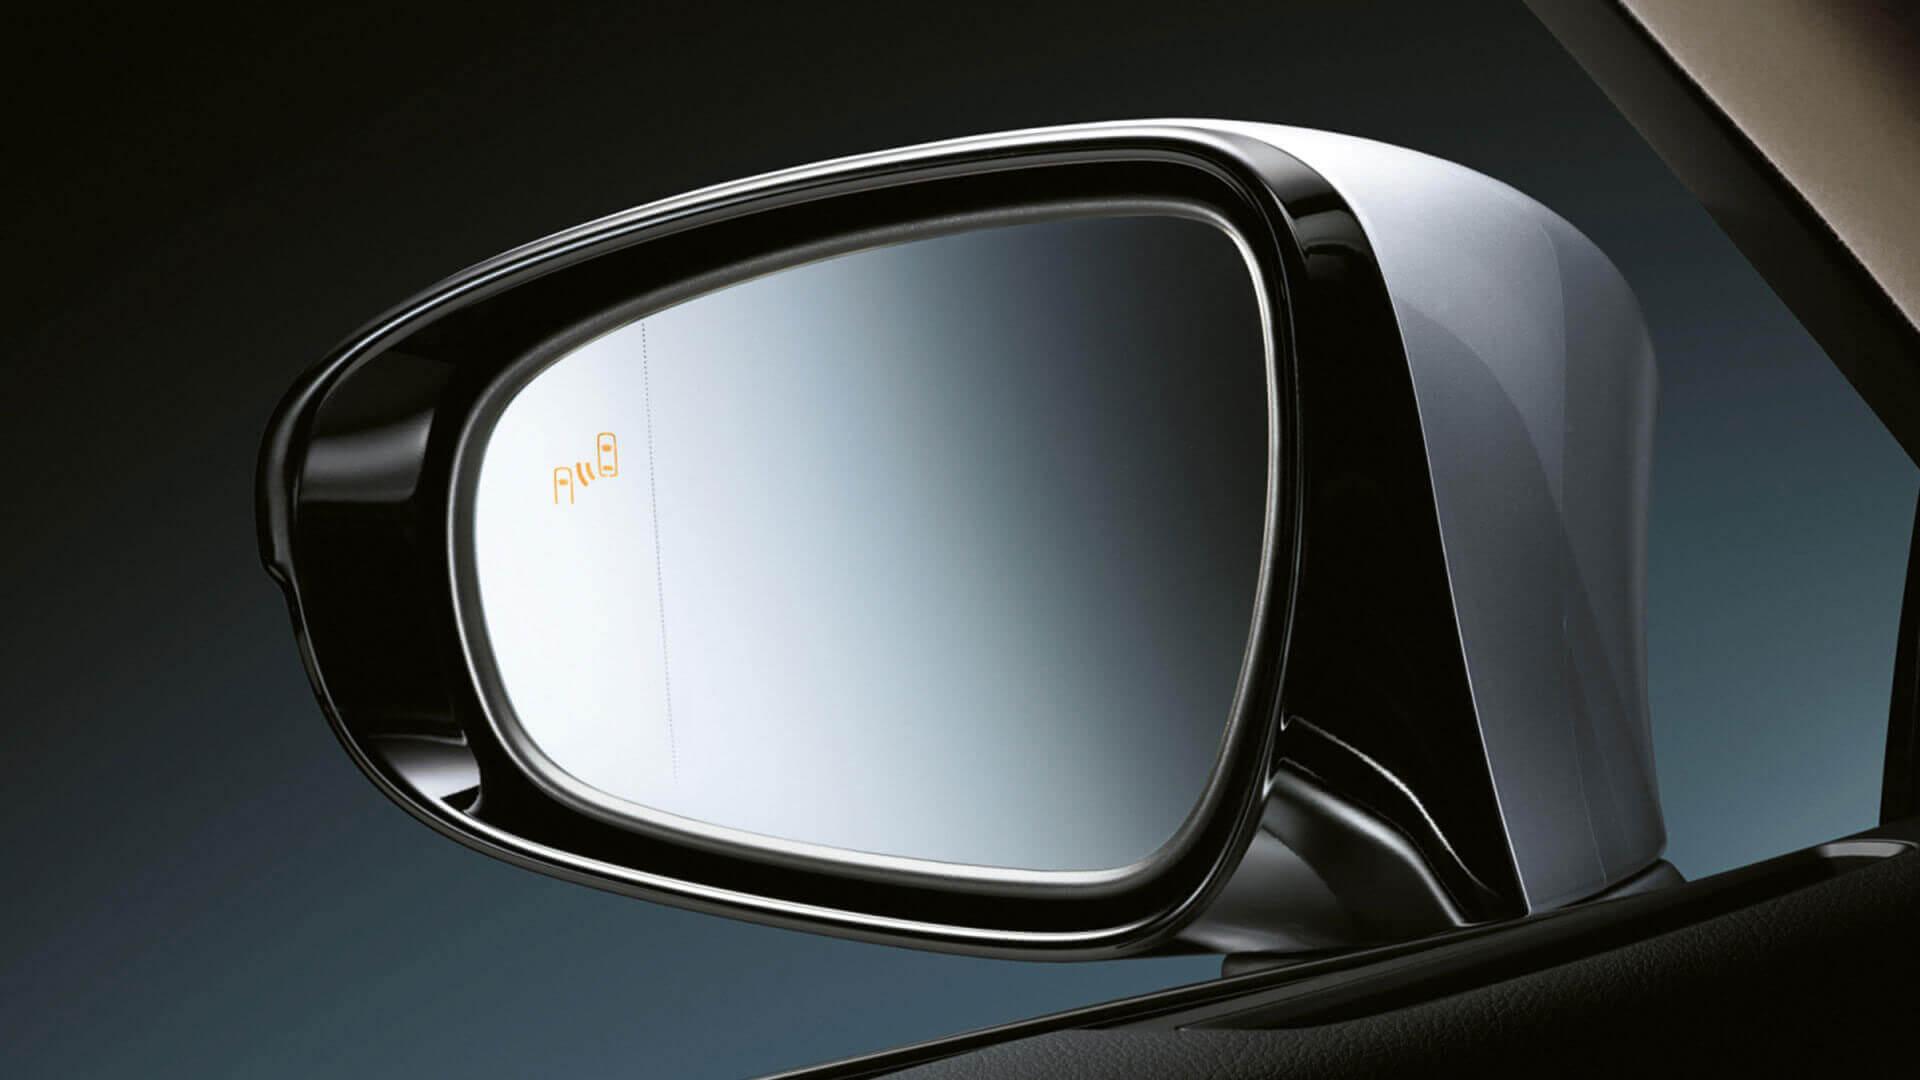 2017 lexus gs 200t features blind spot monitor